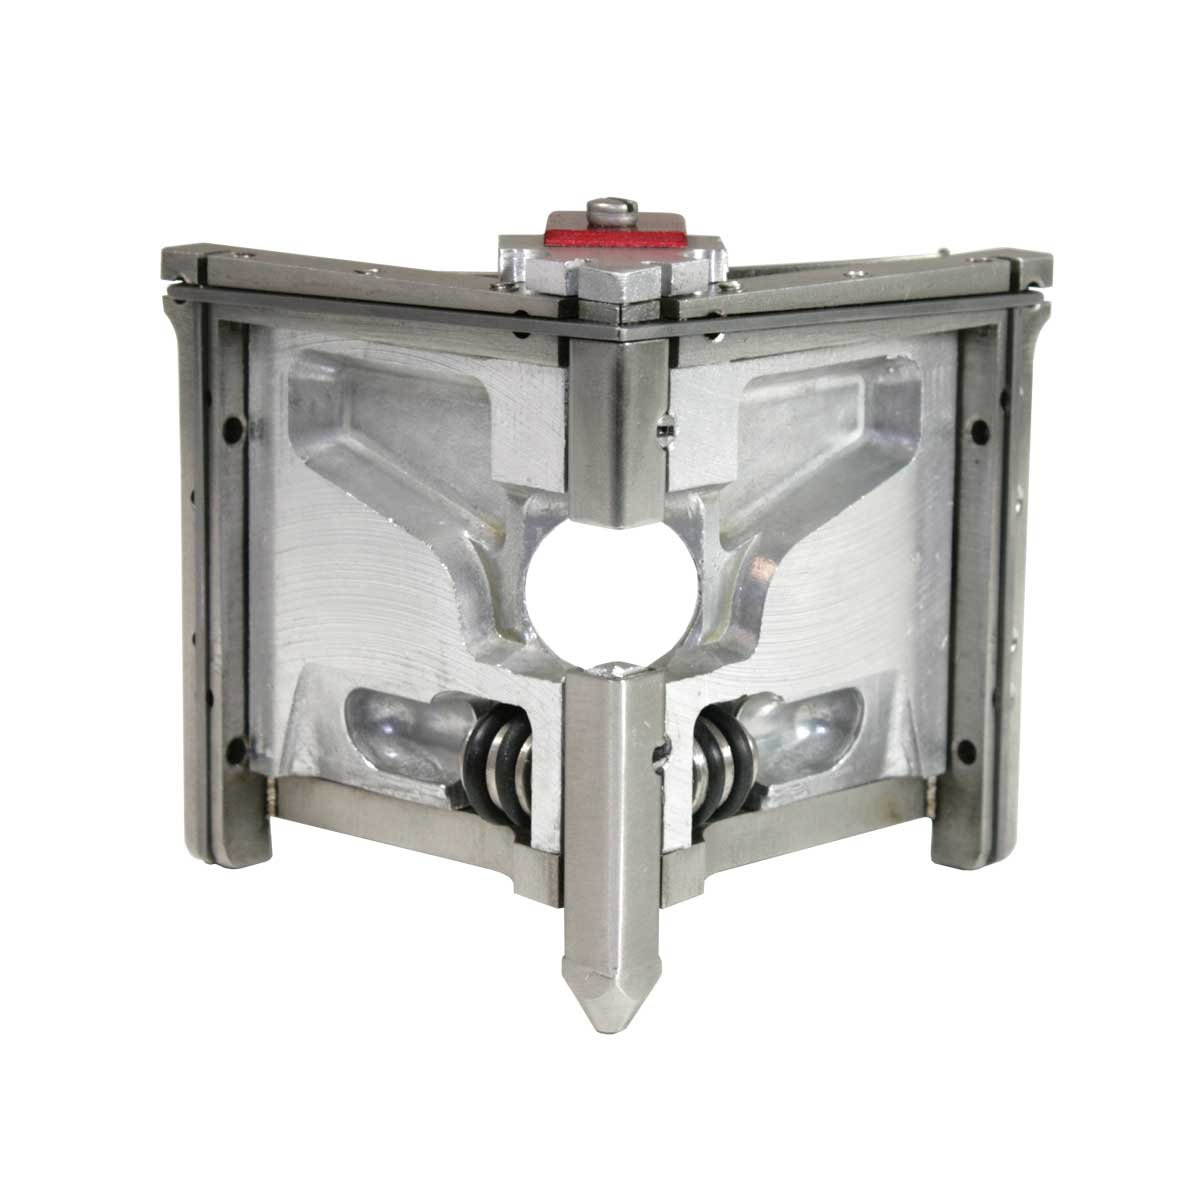 Level5 Drywall Angle Head / Corner Finisher with Wheels (2.5'' Angle Head)